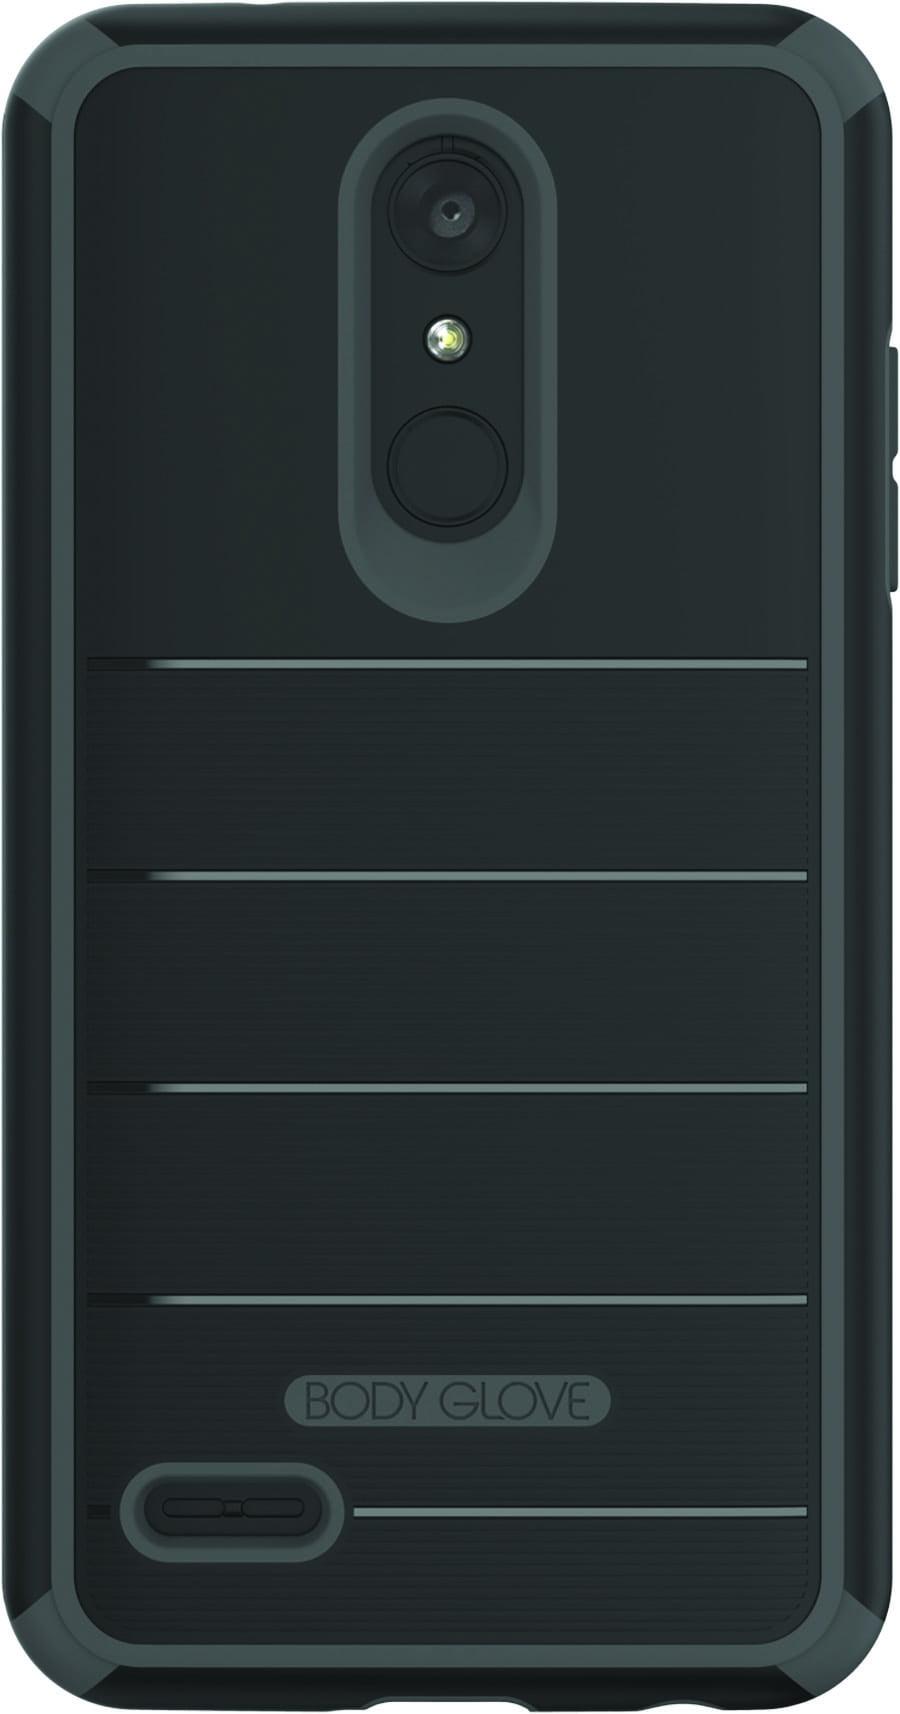 Body Glove Nova Black Phone Case For LG Premier Pro LTE, LG K20 (2018), LG K30, LG Harmony 2 by Fellowes Inc.